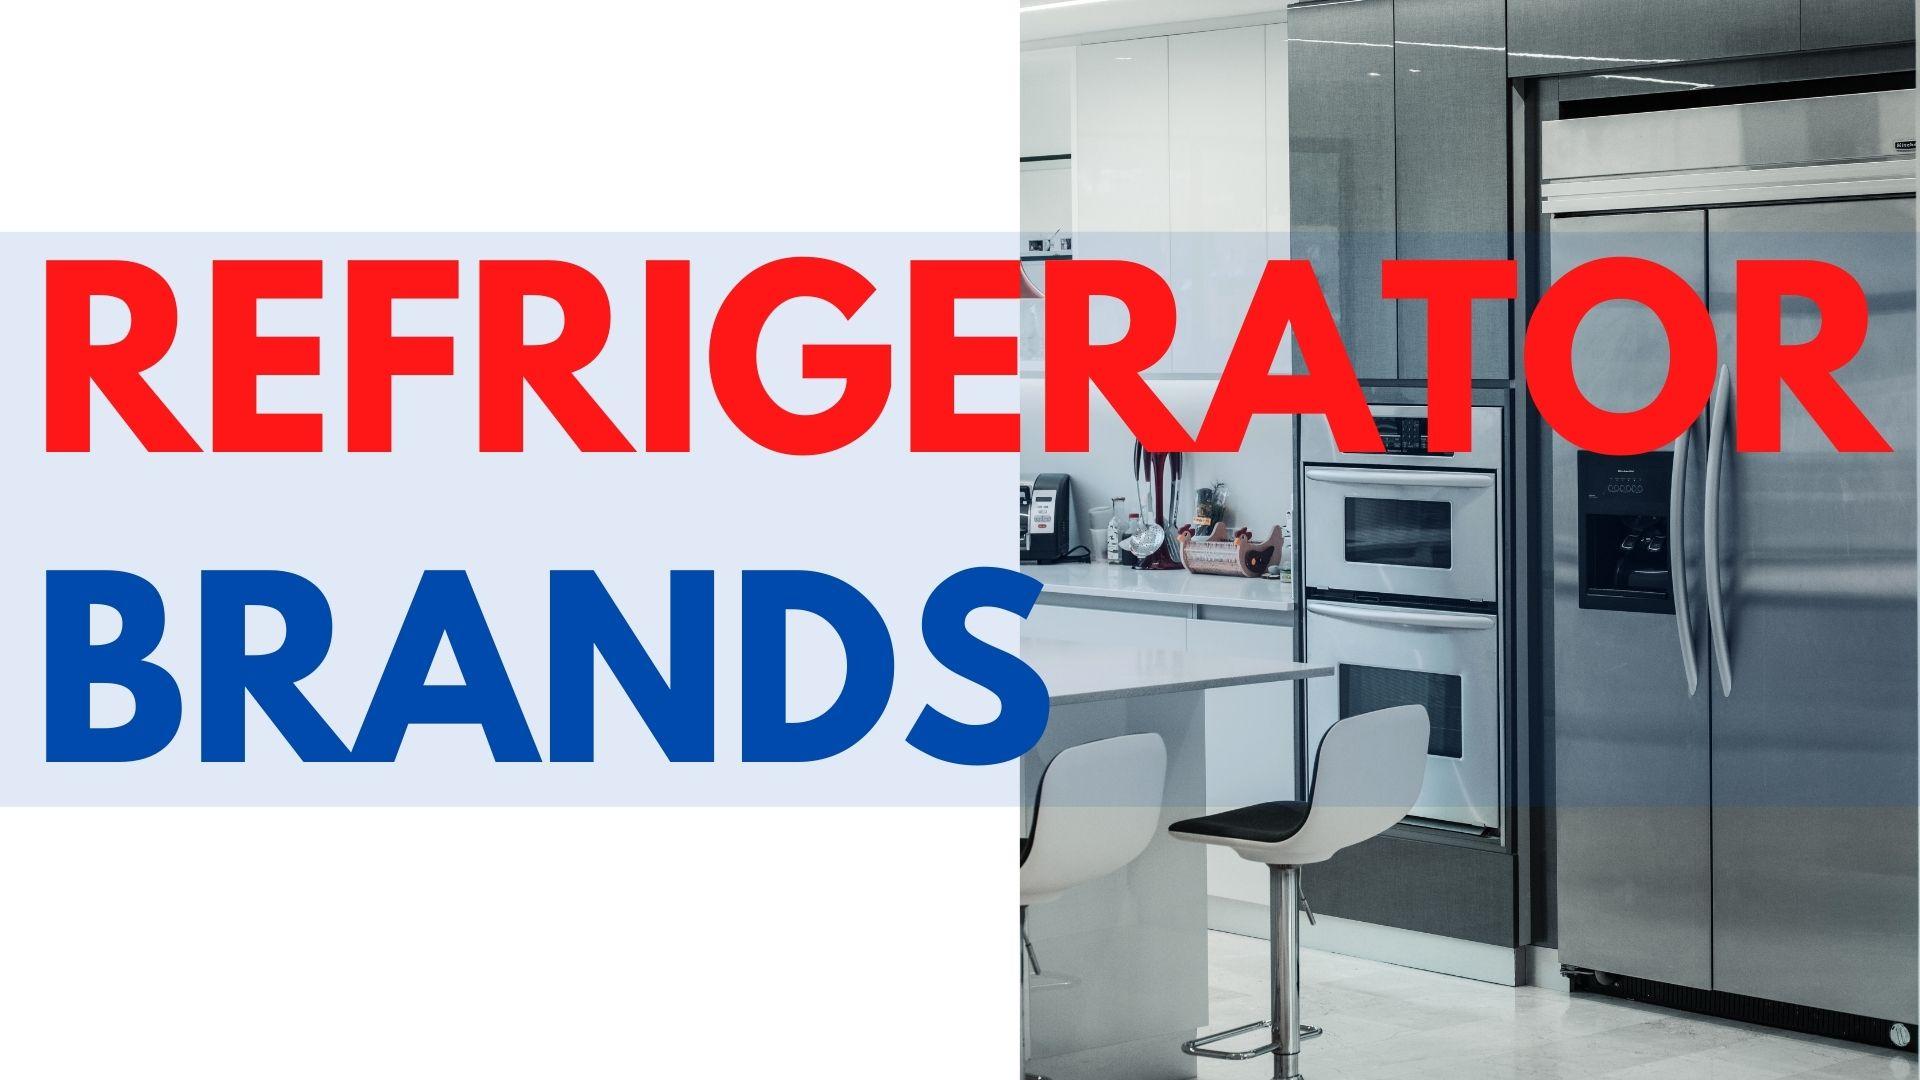 refrigerator brands